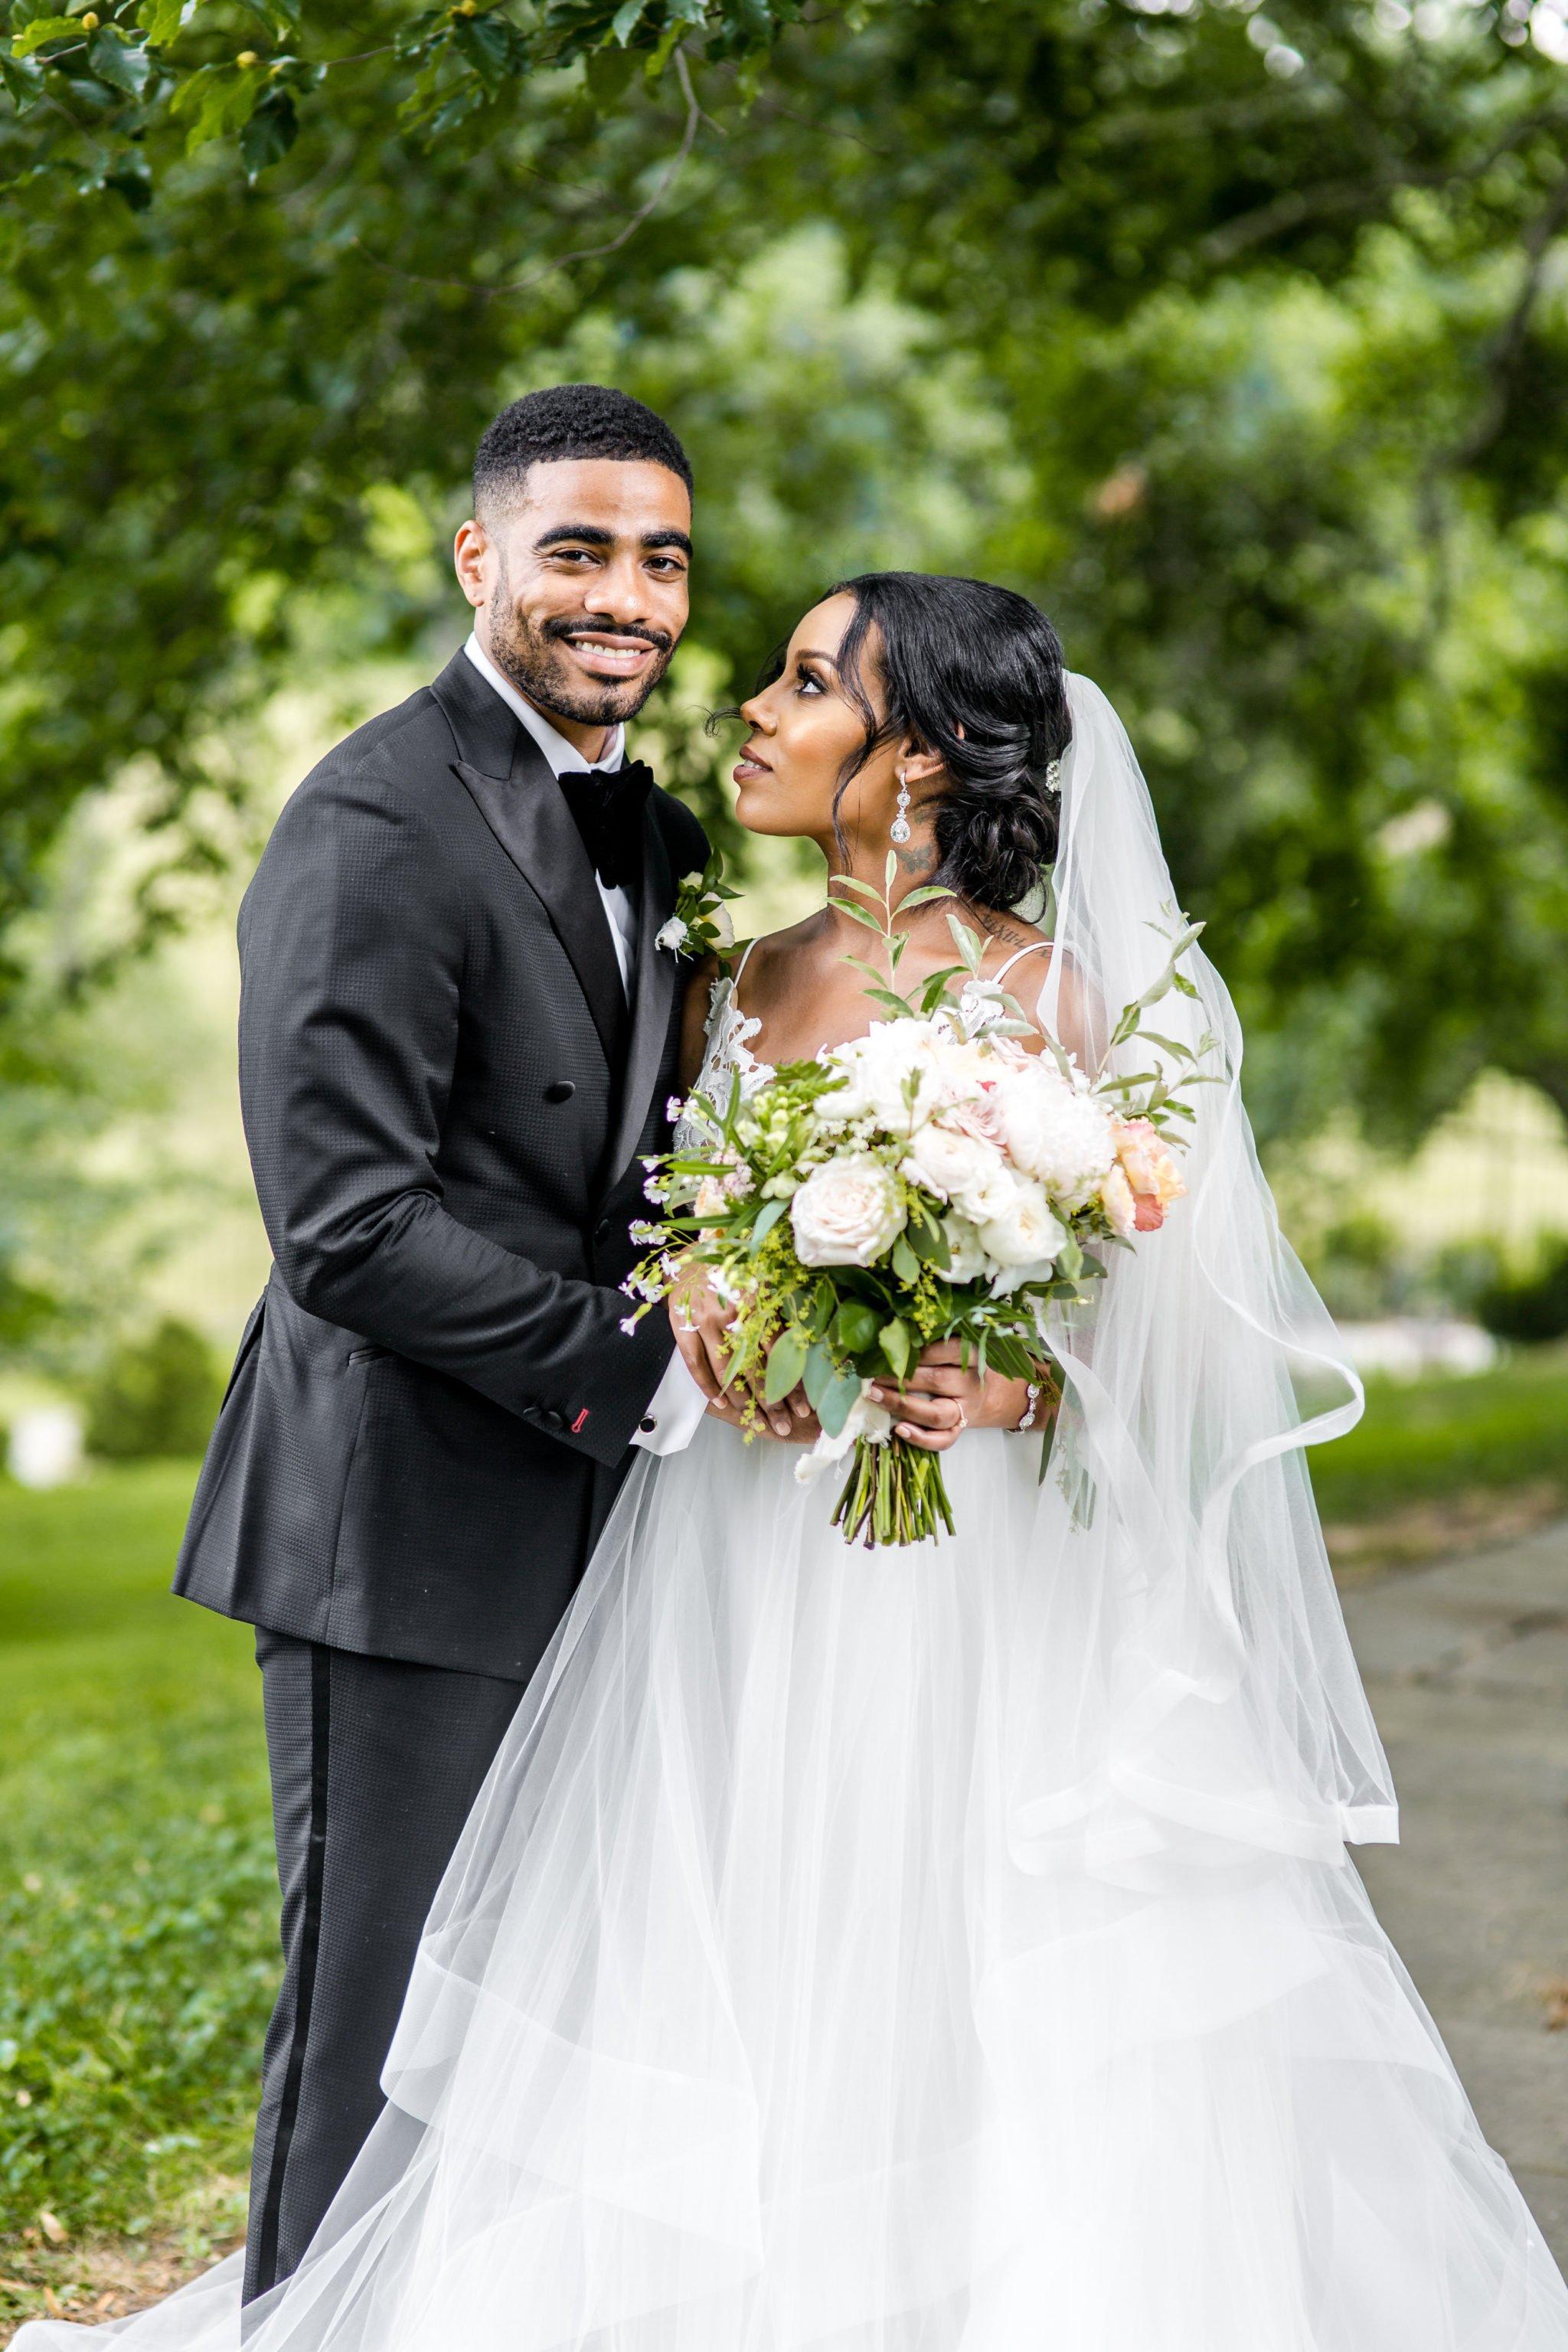 c7f2f24b47 Meron Kassahun and Reshad Favors s Glamorous Summer Wedding